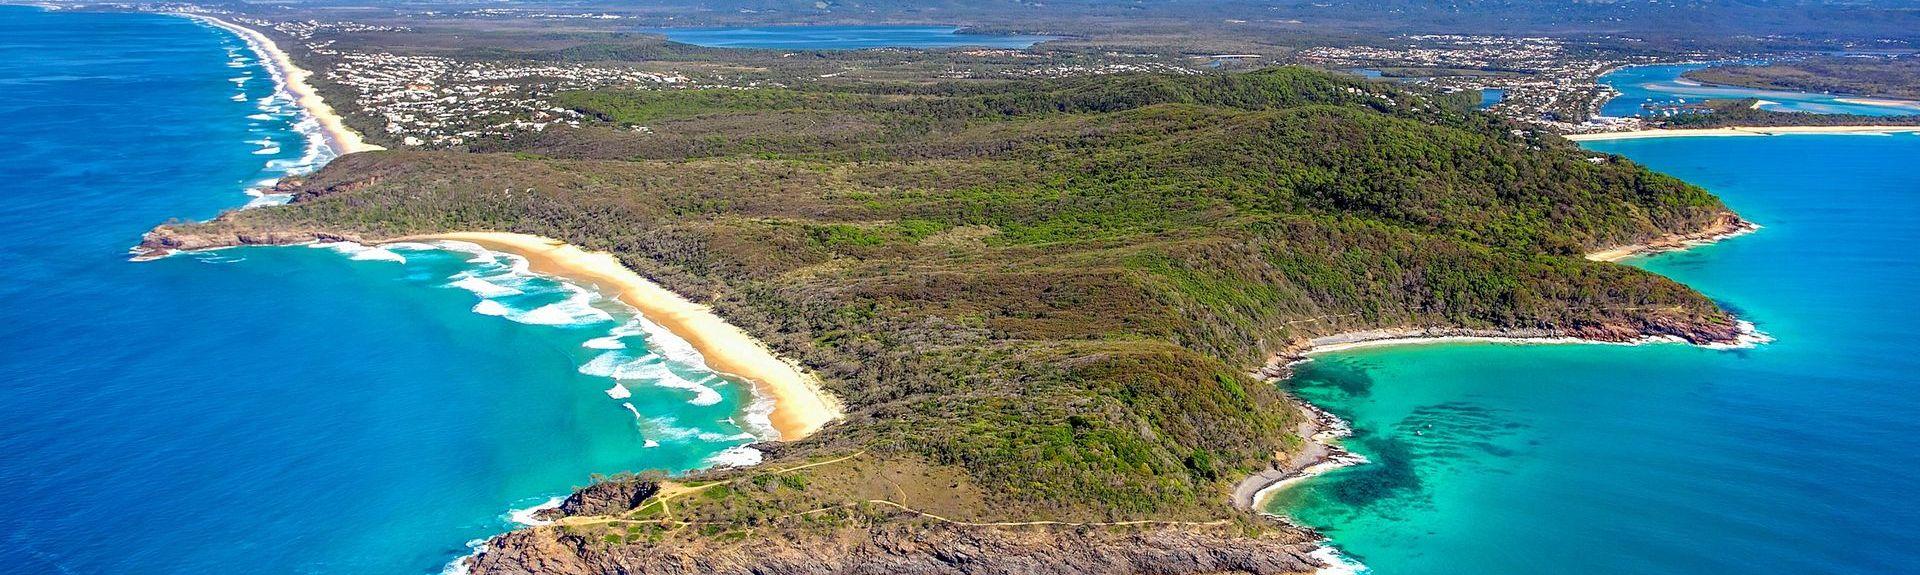 Sunshine Beach QLD, Australia